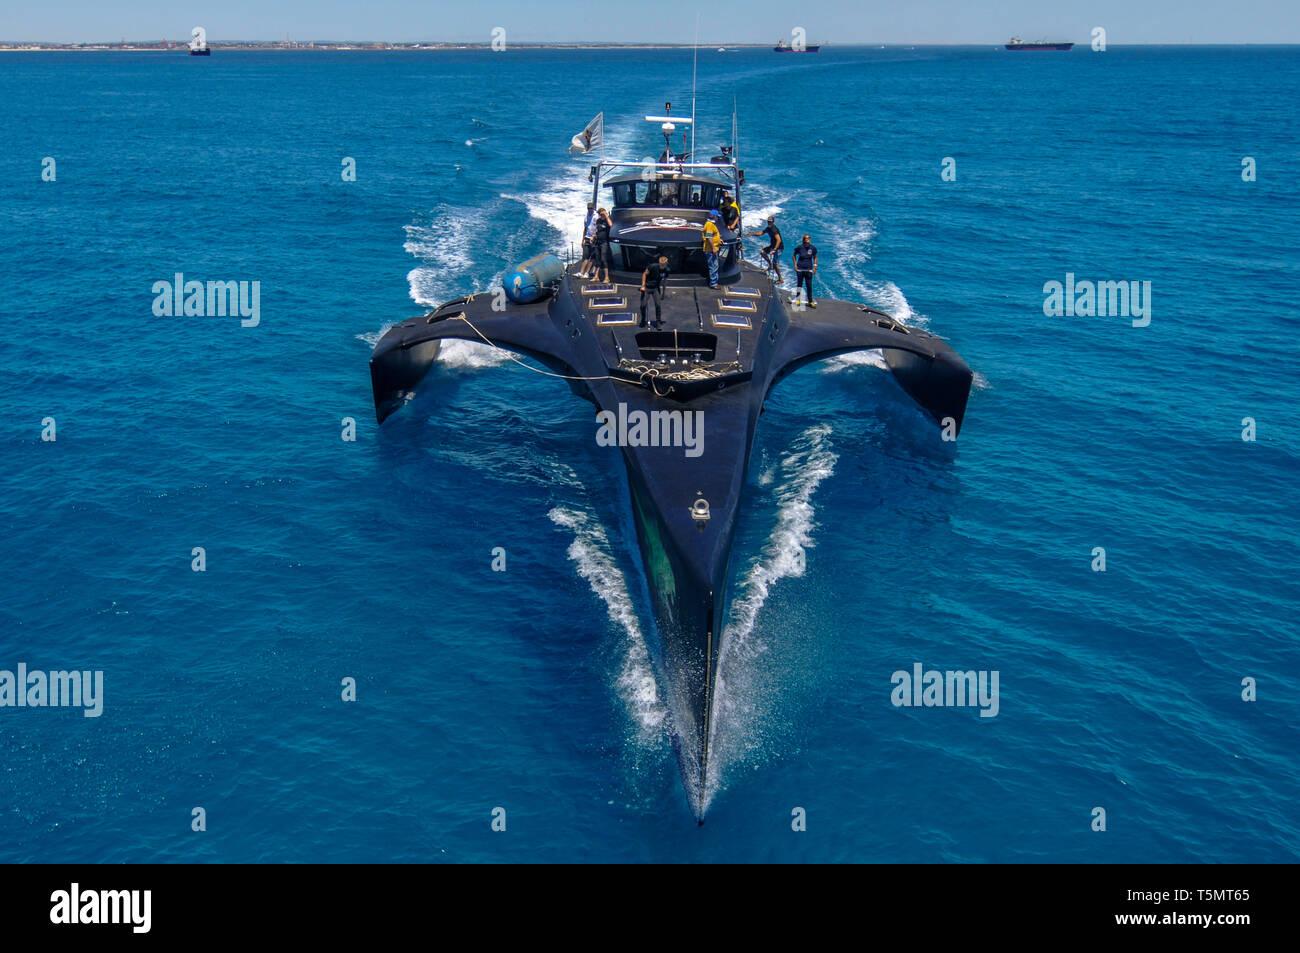 An elevated head on view of the anti-whaling Sea Shepherd MV Gojira trimaran (now called MV Brigitte Bardot) at speed towards the camera. - Stock Image